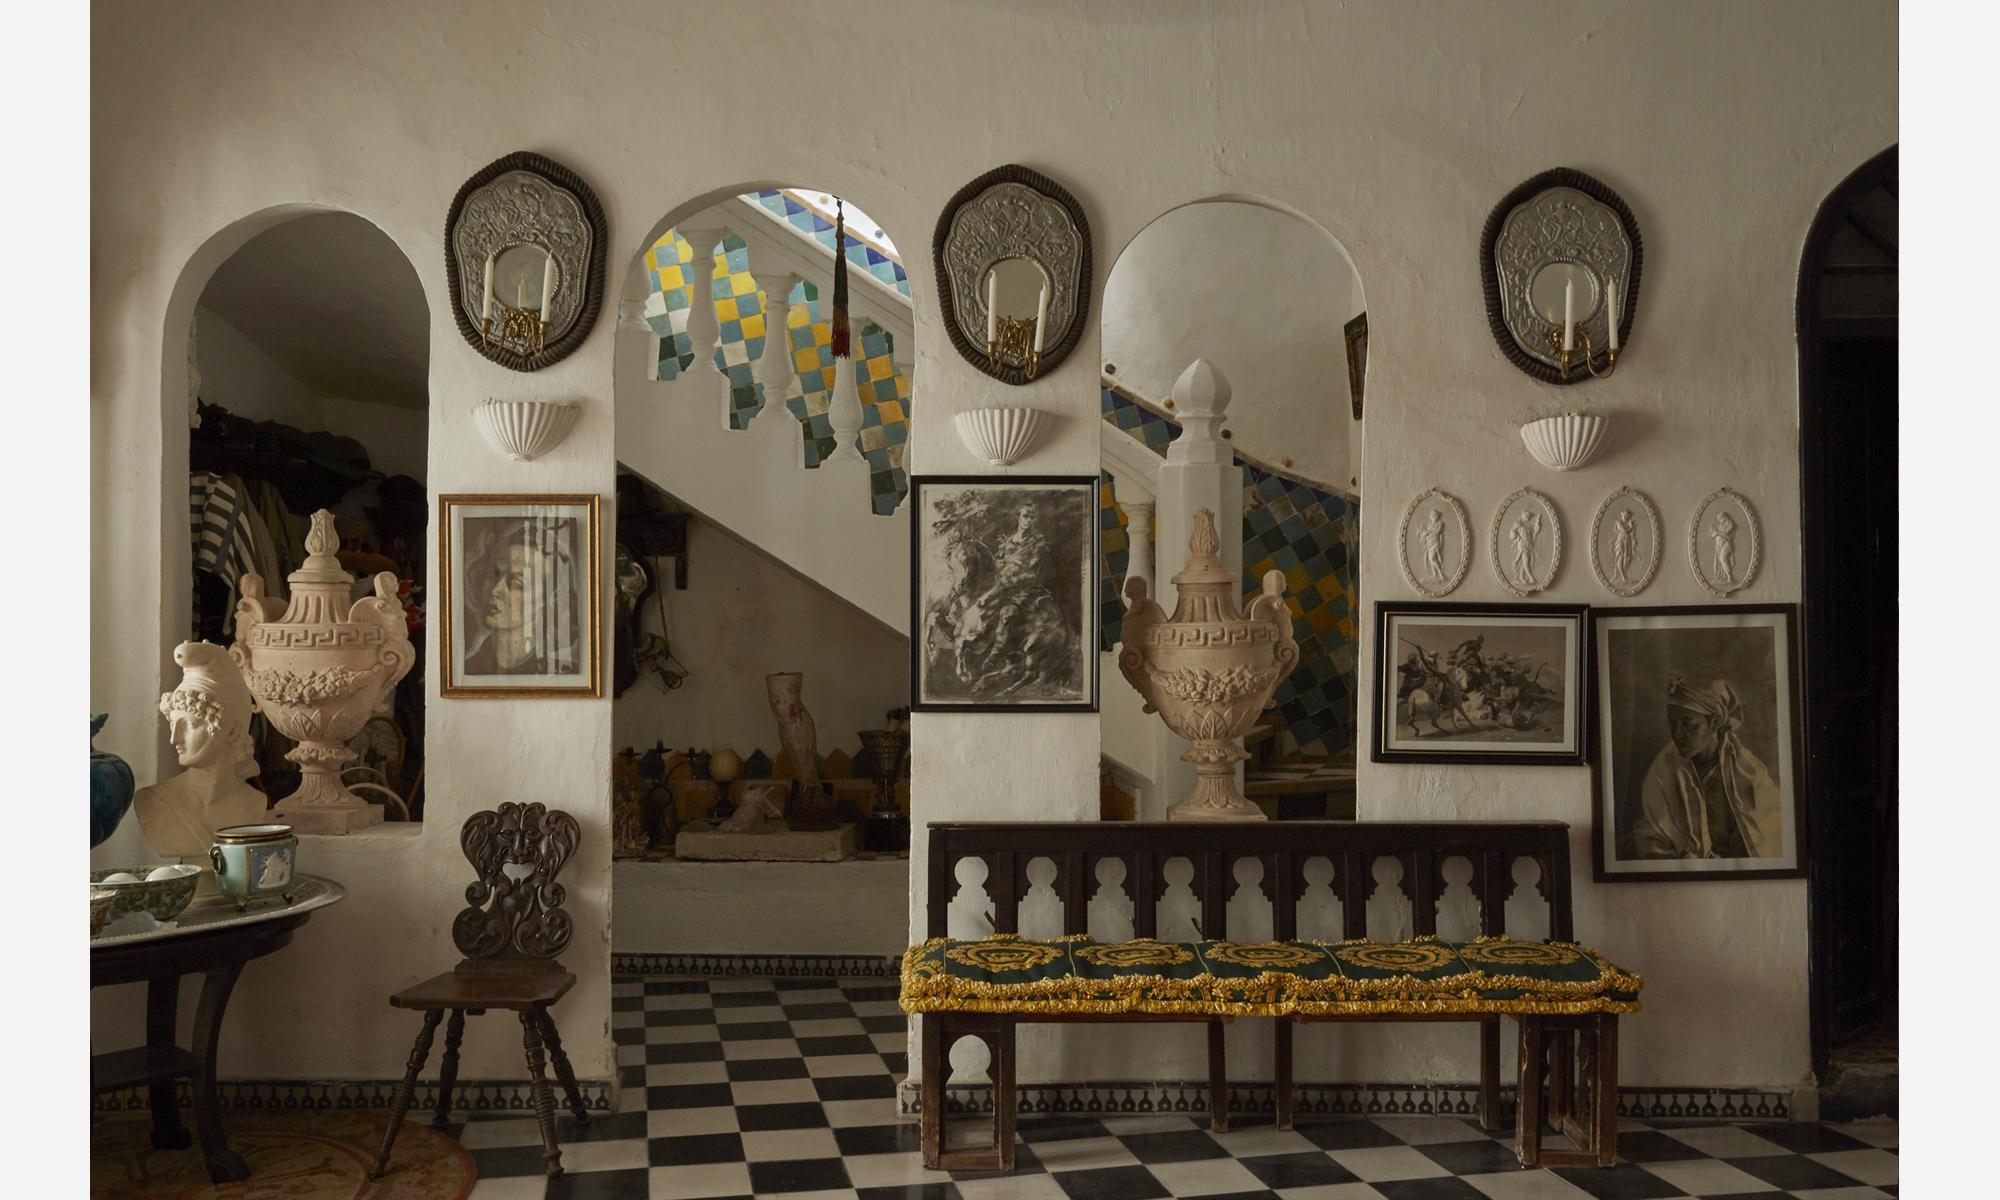 Guido Taroni: Inside Tanger